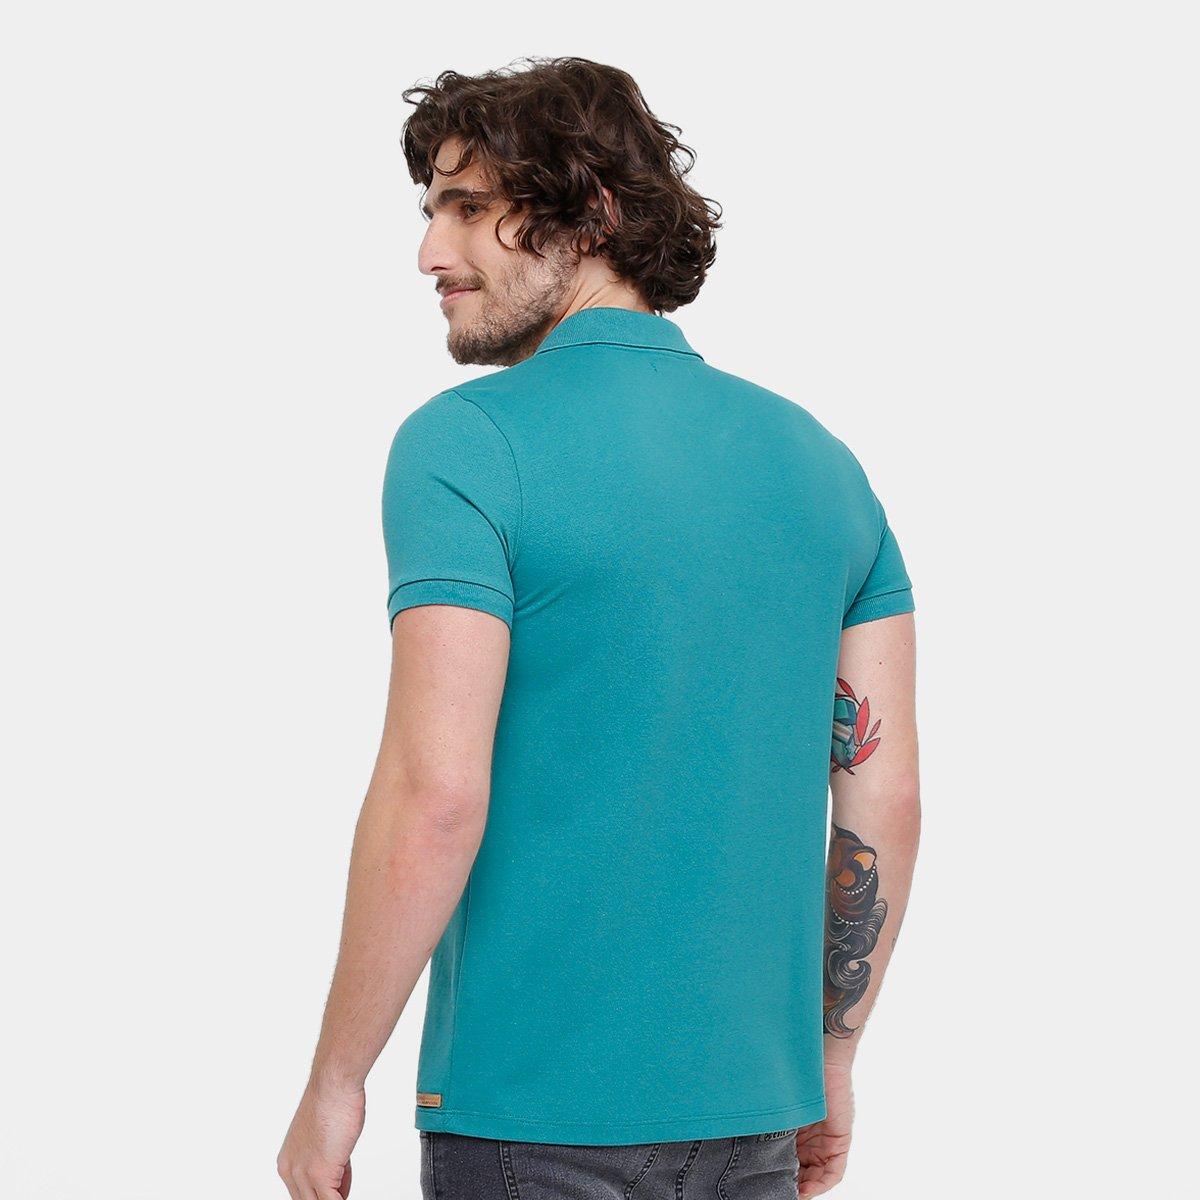 0257cce77b Camisa Polo Kohmar Piquet Básica Masculina - Verde água - Compre ...